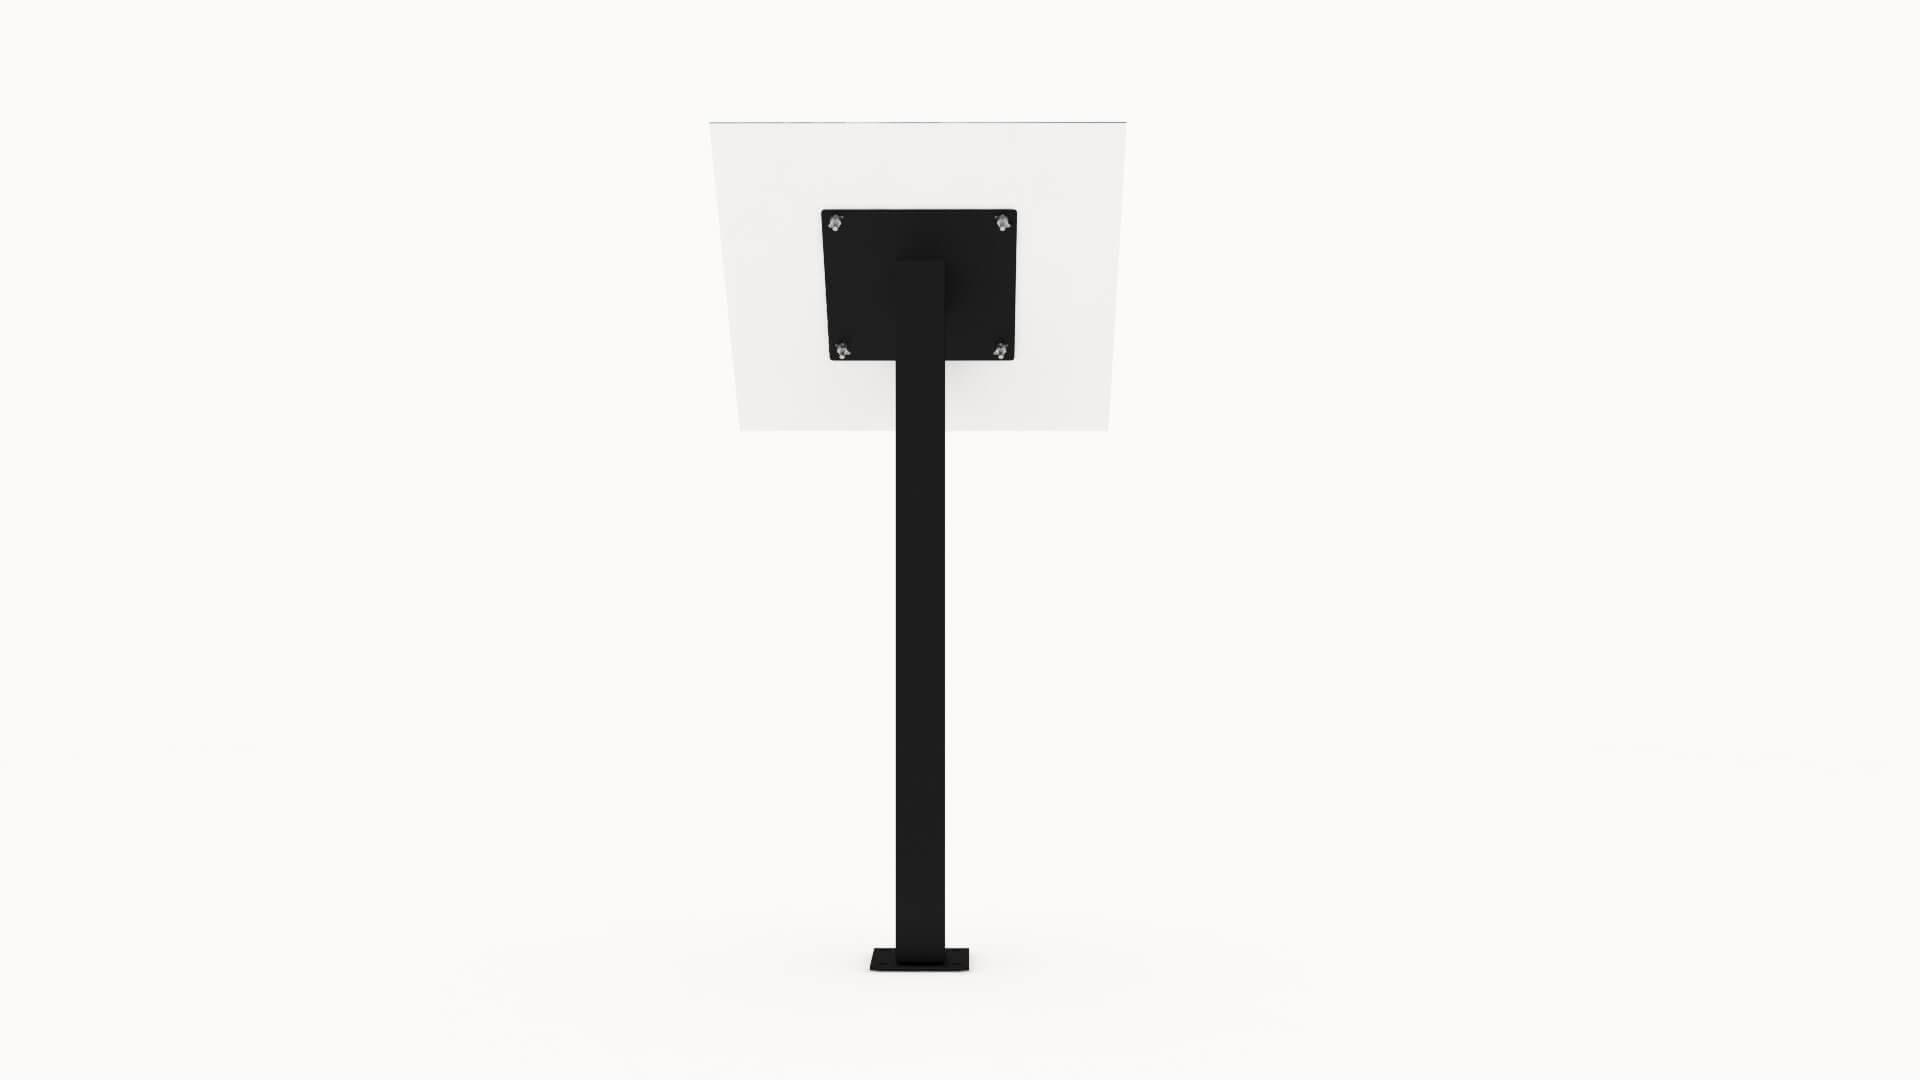 ALTO™ single pedestal sign and panelmount.